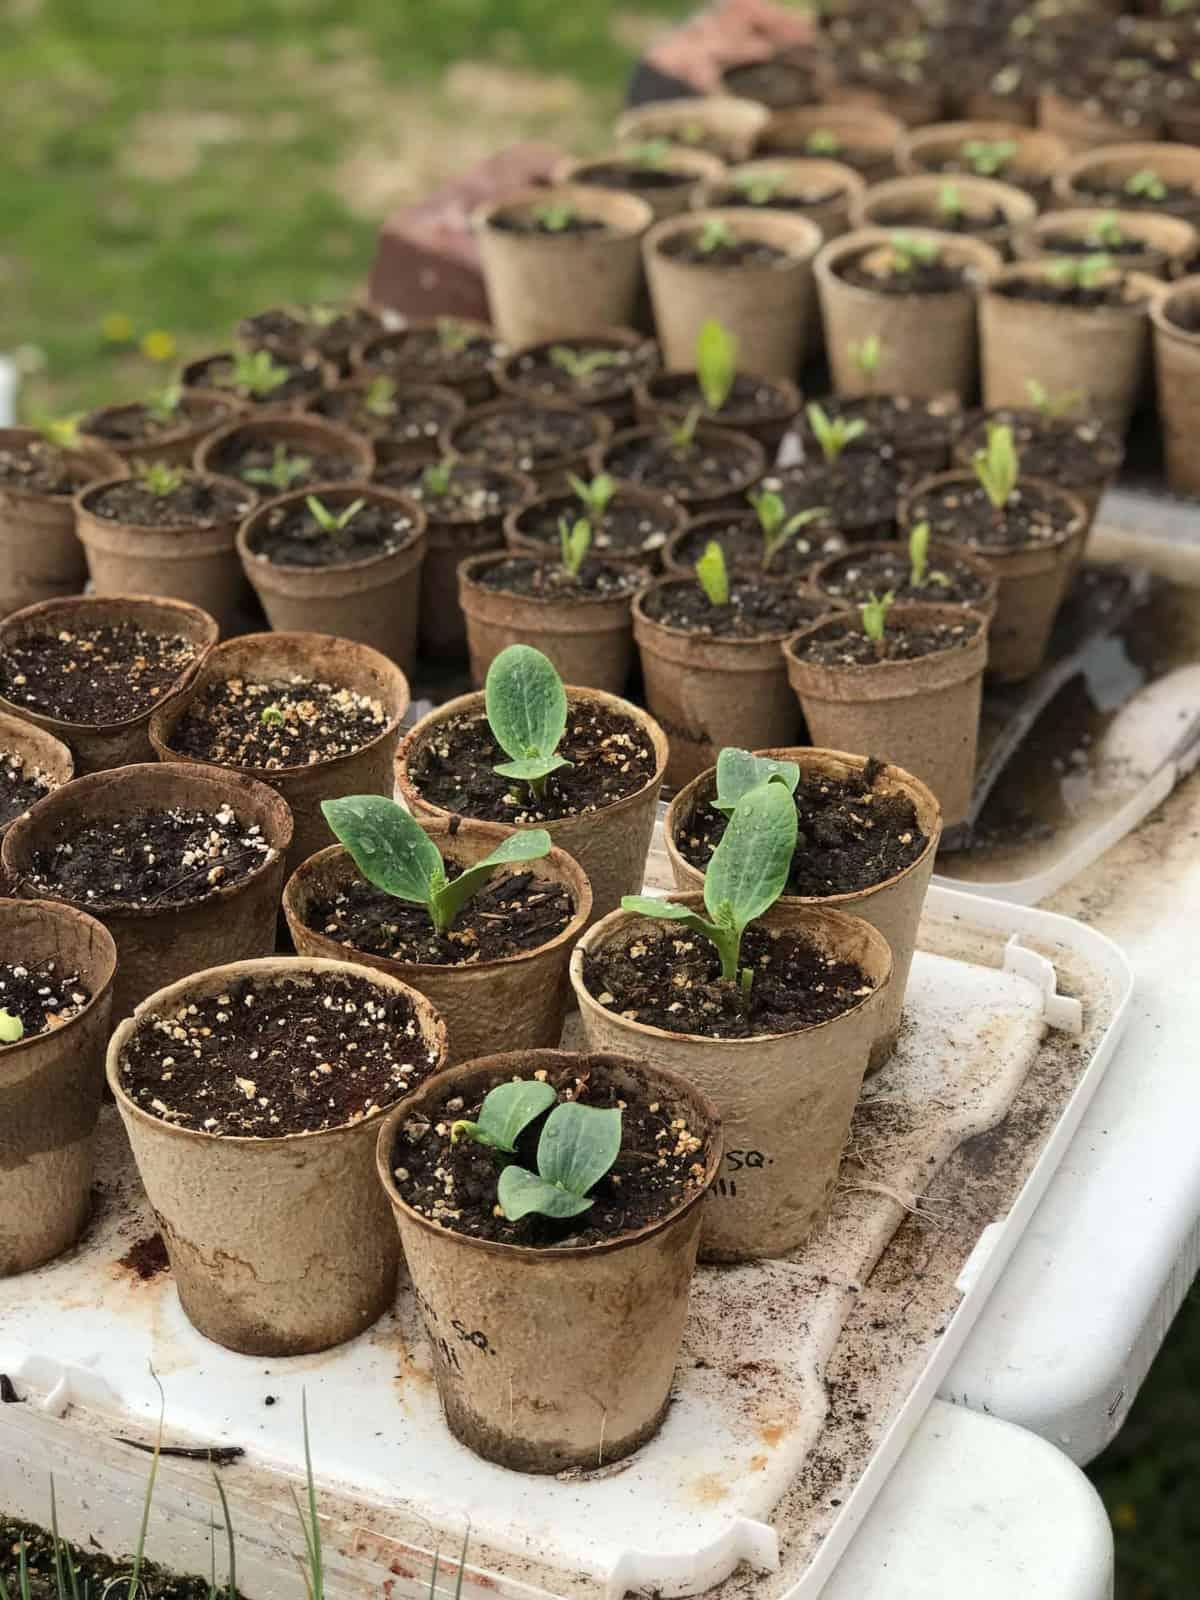 Seedlings in compostable pots.